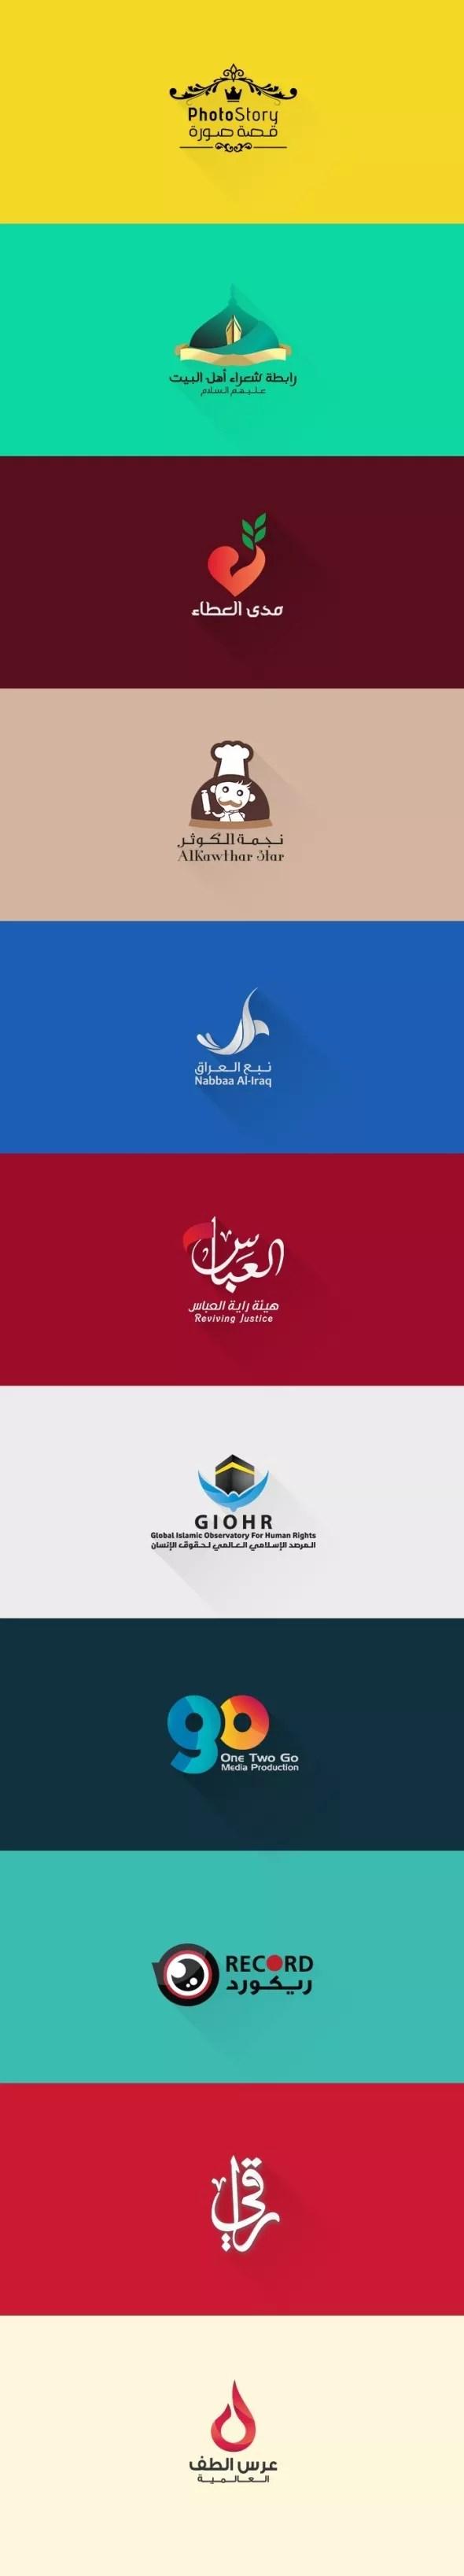 ARabic logos 7